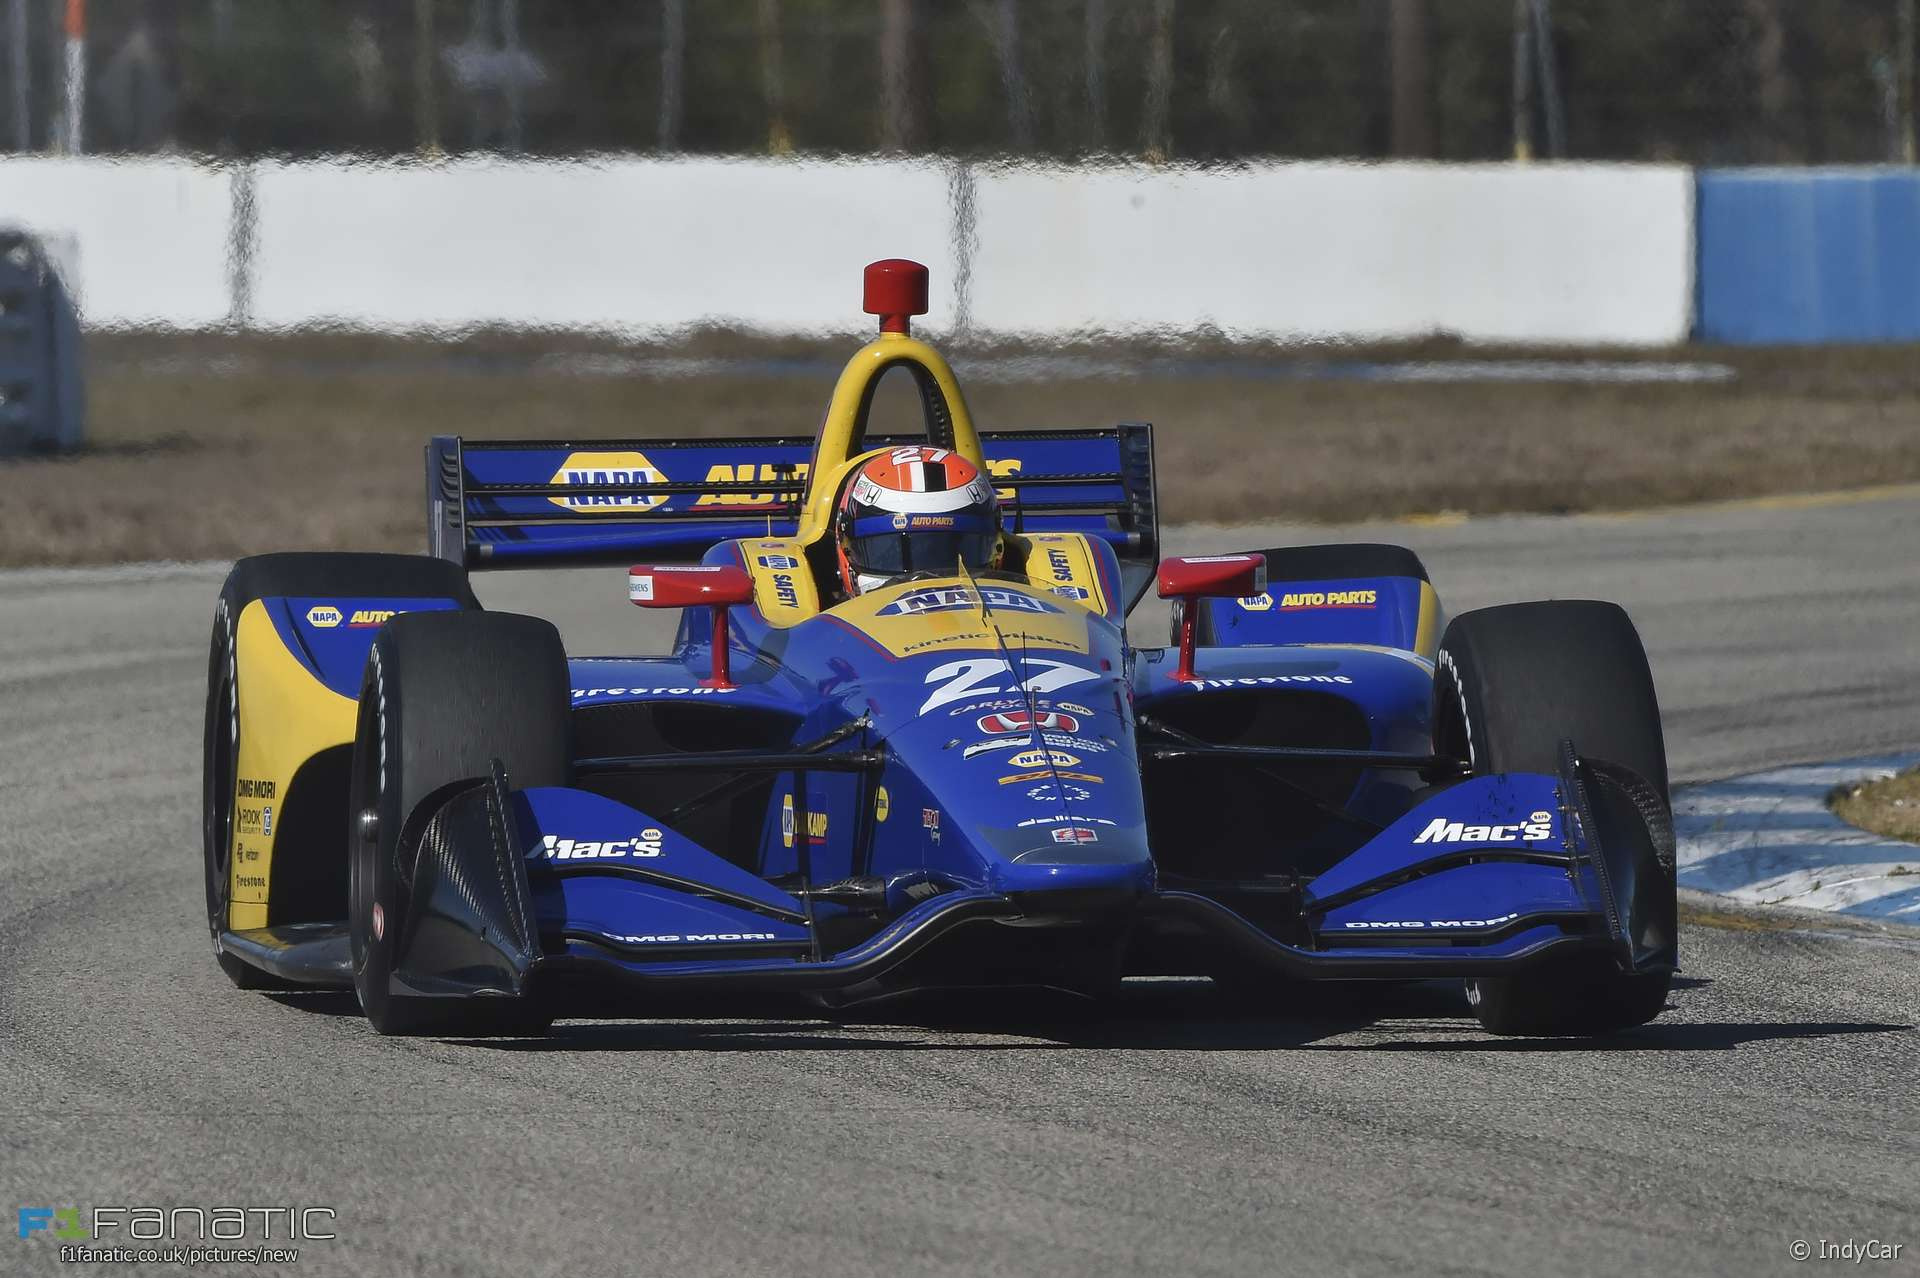 Alexander Rossi, Andretti, IndyCar, Sebring, 2018